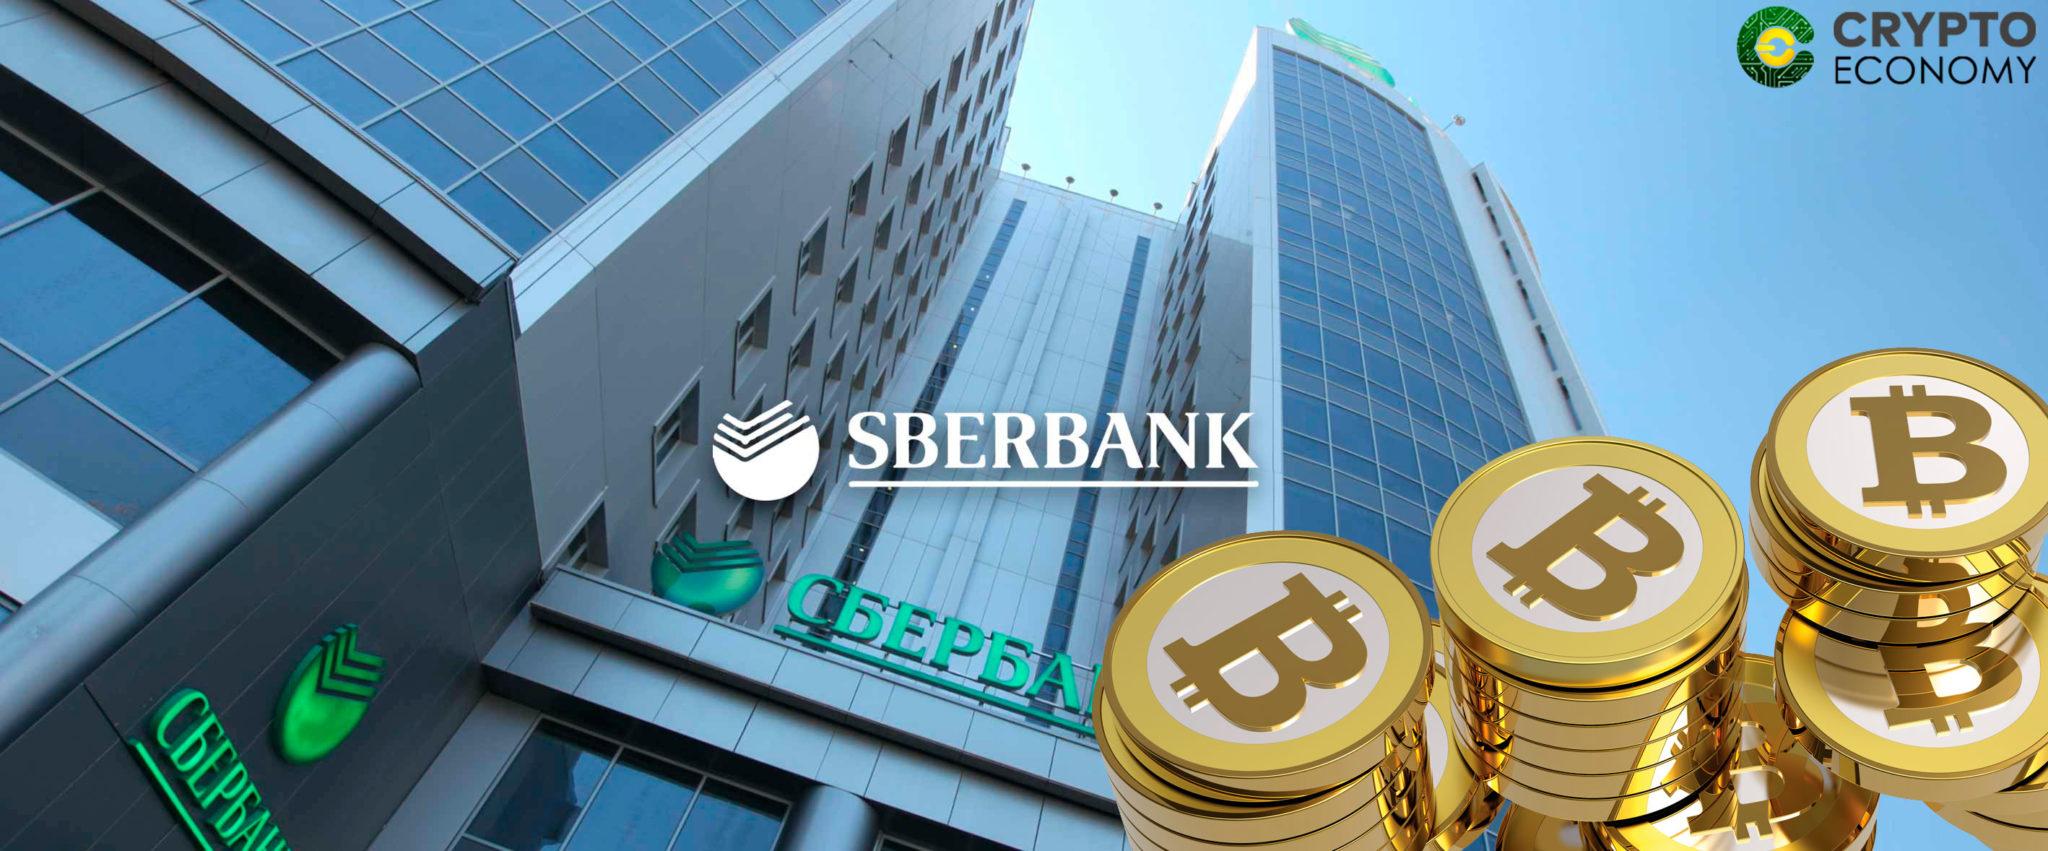 Sberbank Bitcoin Russia